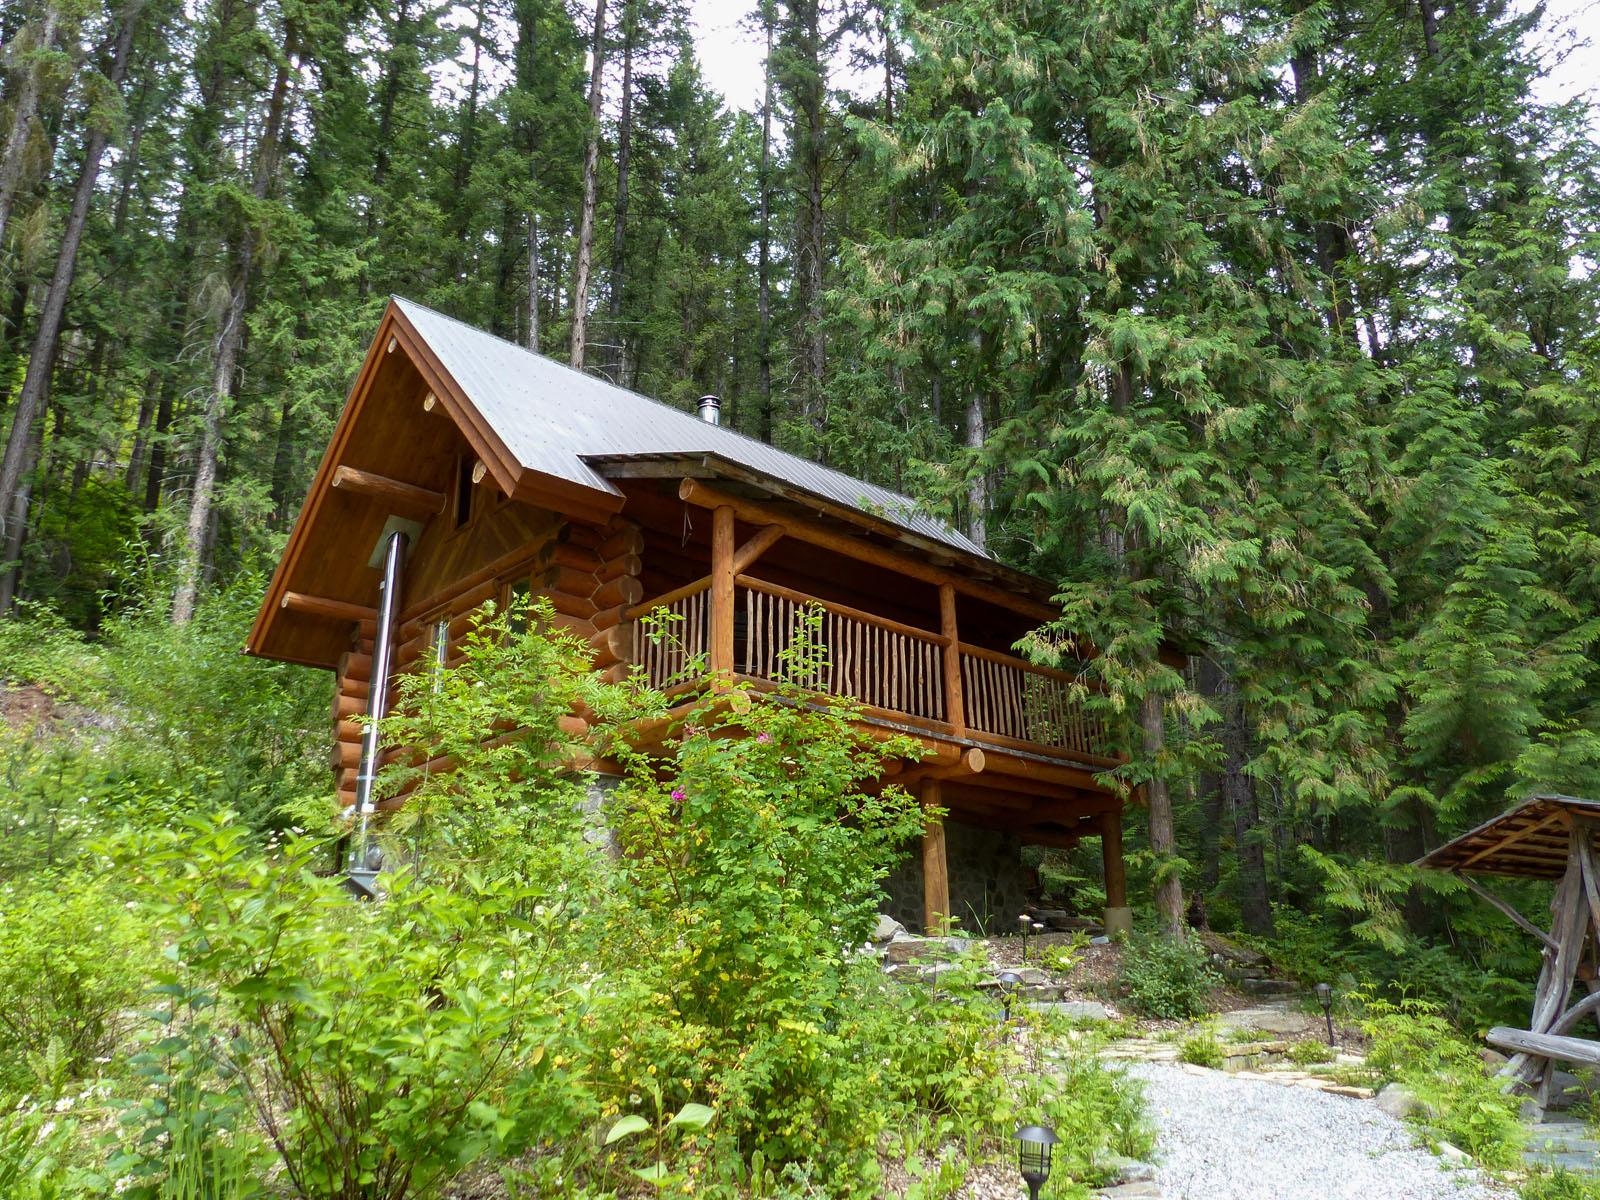 Mount robson log home 24